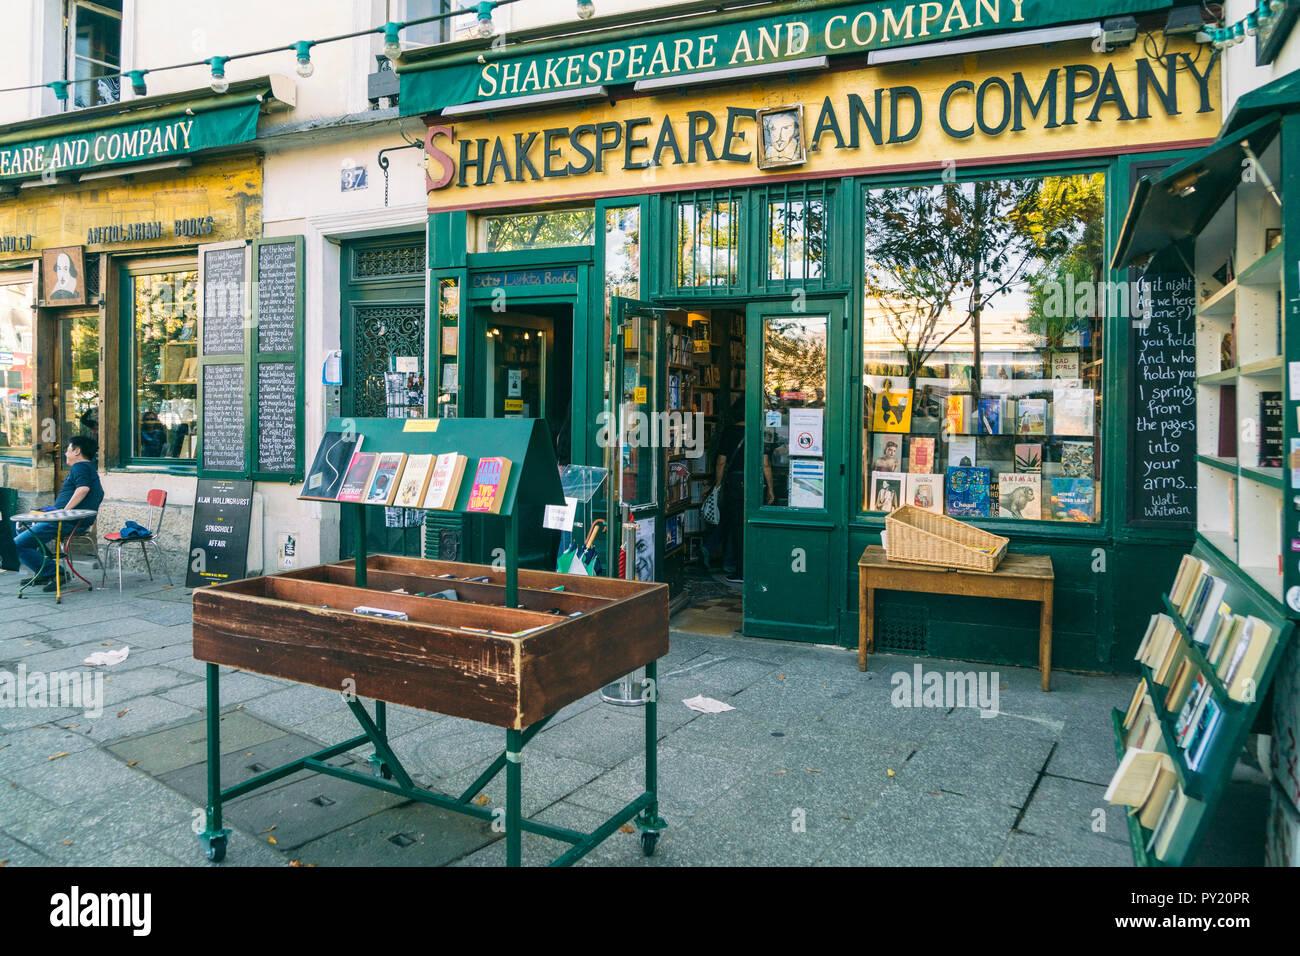 Shakespeare and company bookstore at Quartier de la Sorbonne which is 20th administrative district or quartier of Paris, Ile-de-France, France Stock Photo